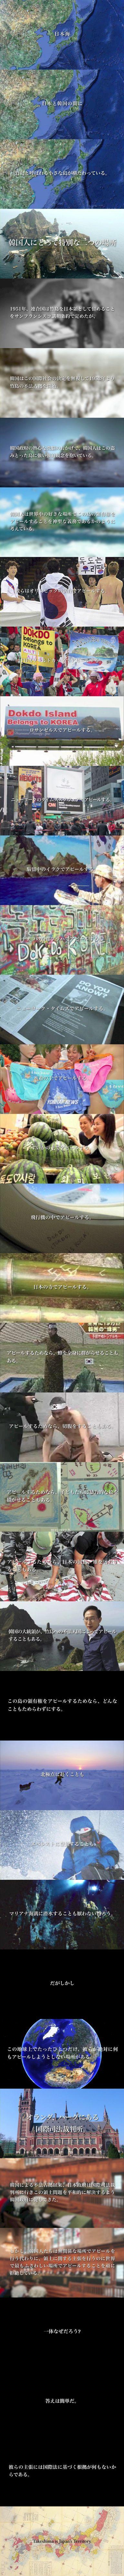 http://livedoor.blogimg.jp/toua2chdqn/imgs/1/1/11045b95.jpg